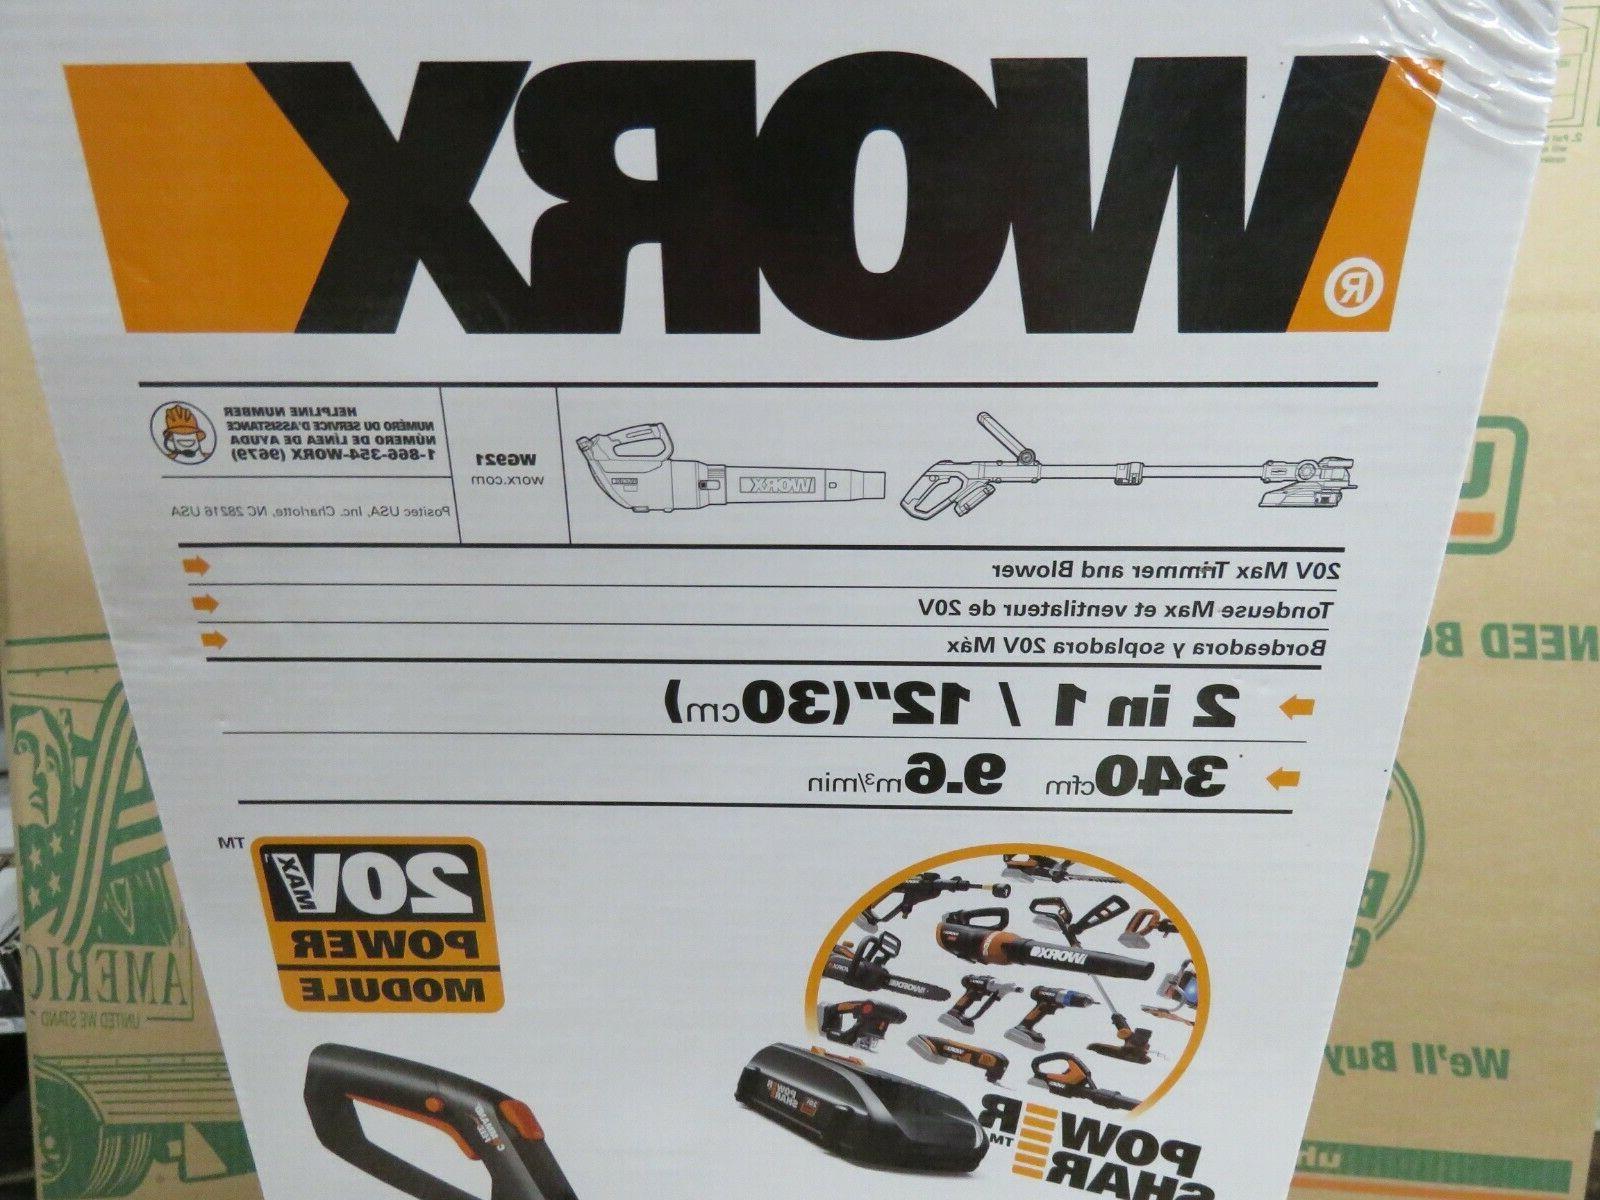 WORX WG921 20V Grass Trimmer / Edger & Leaf Batteries